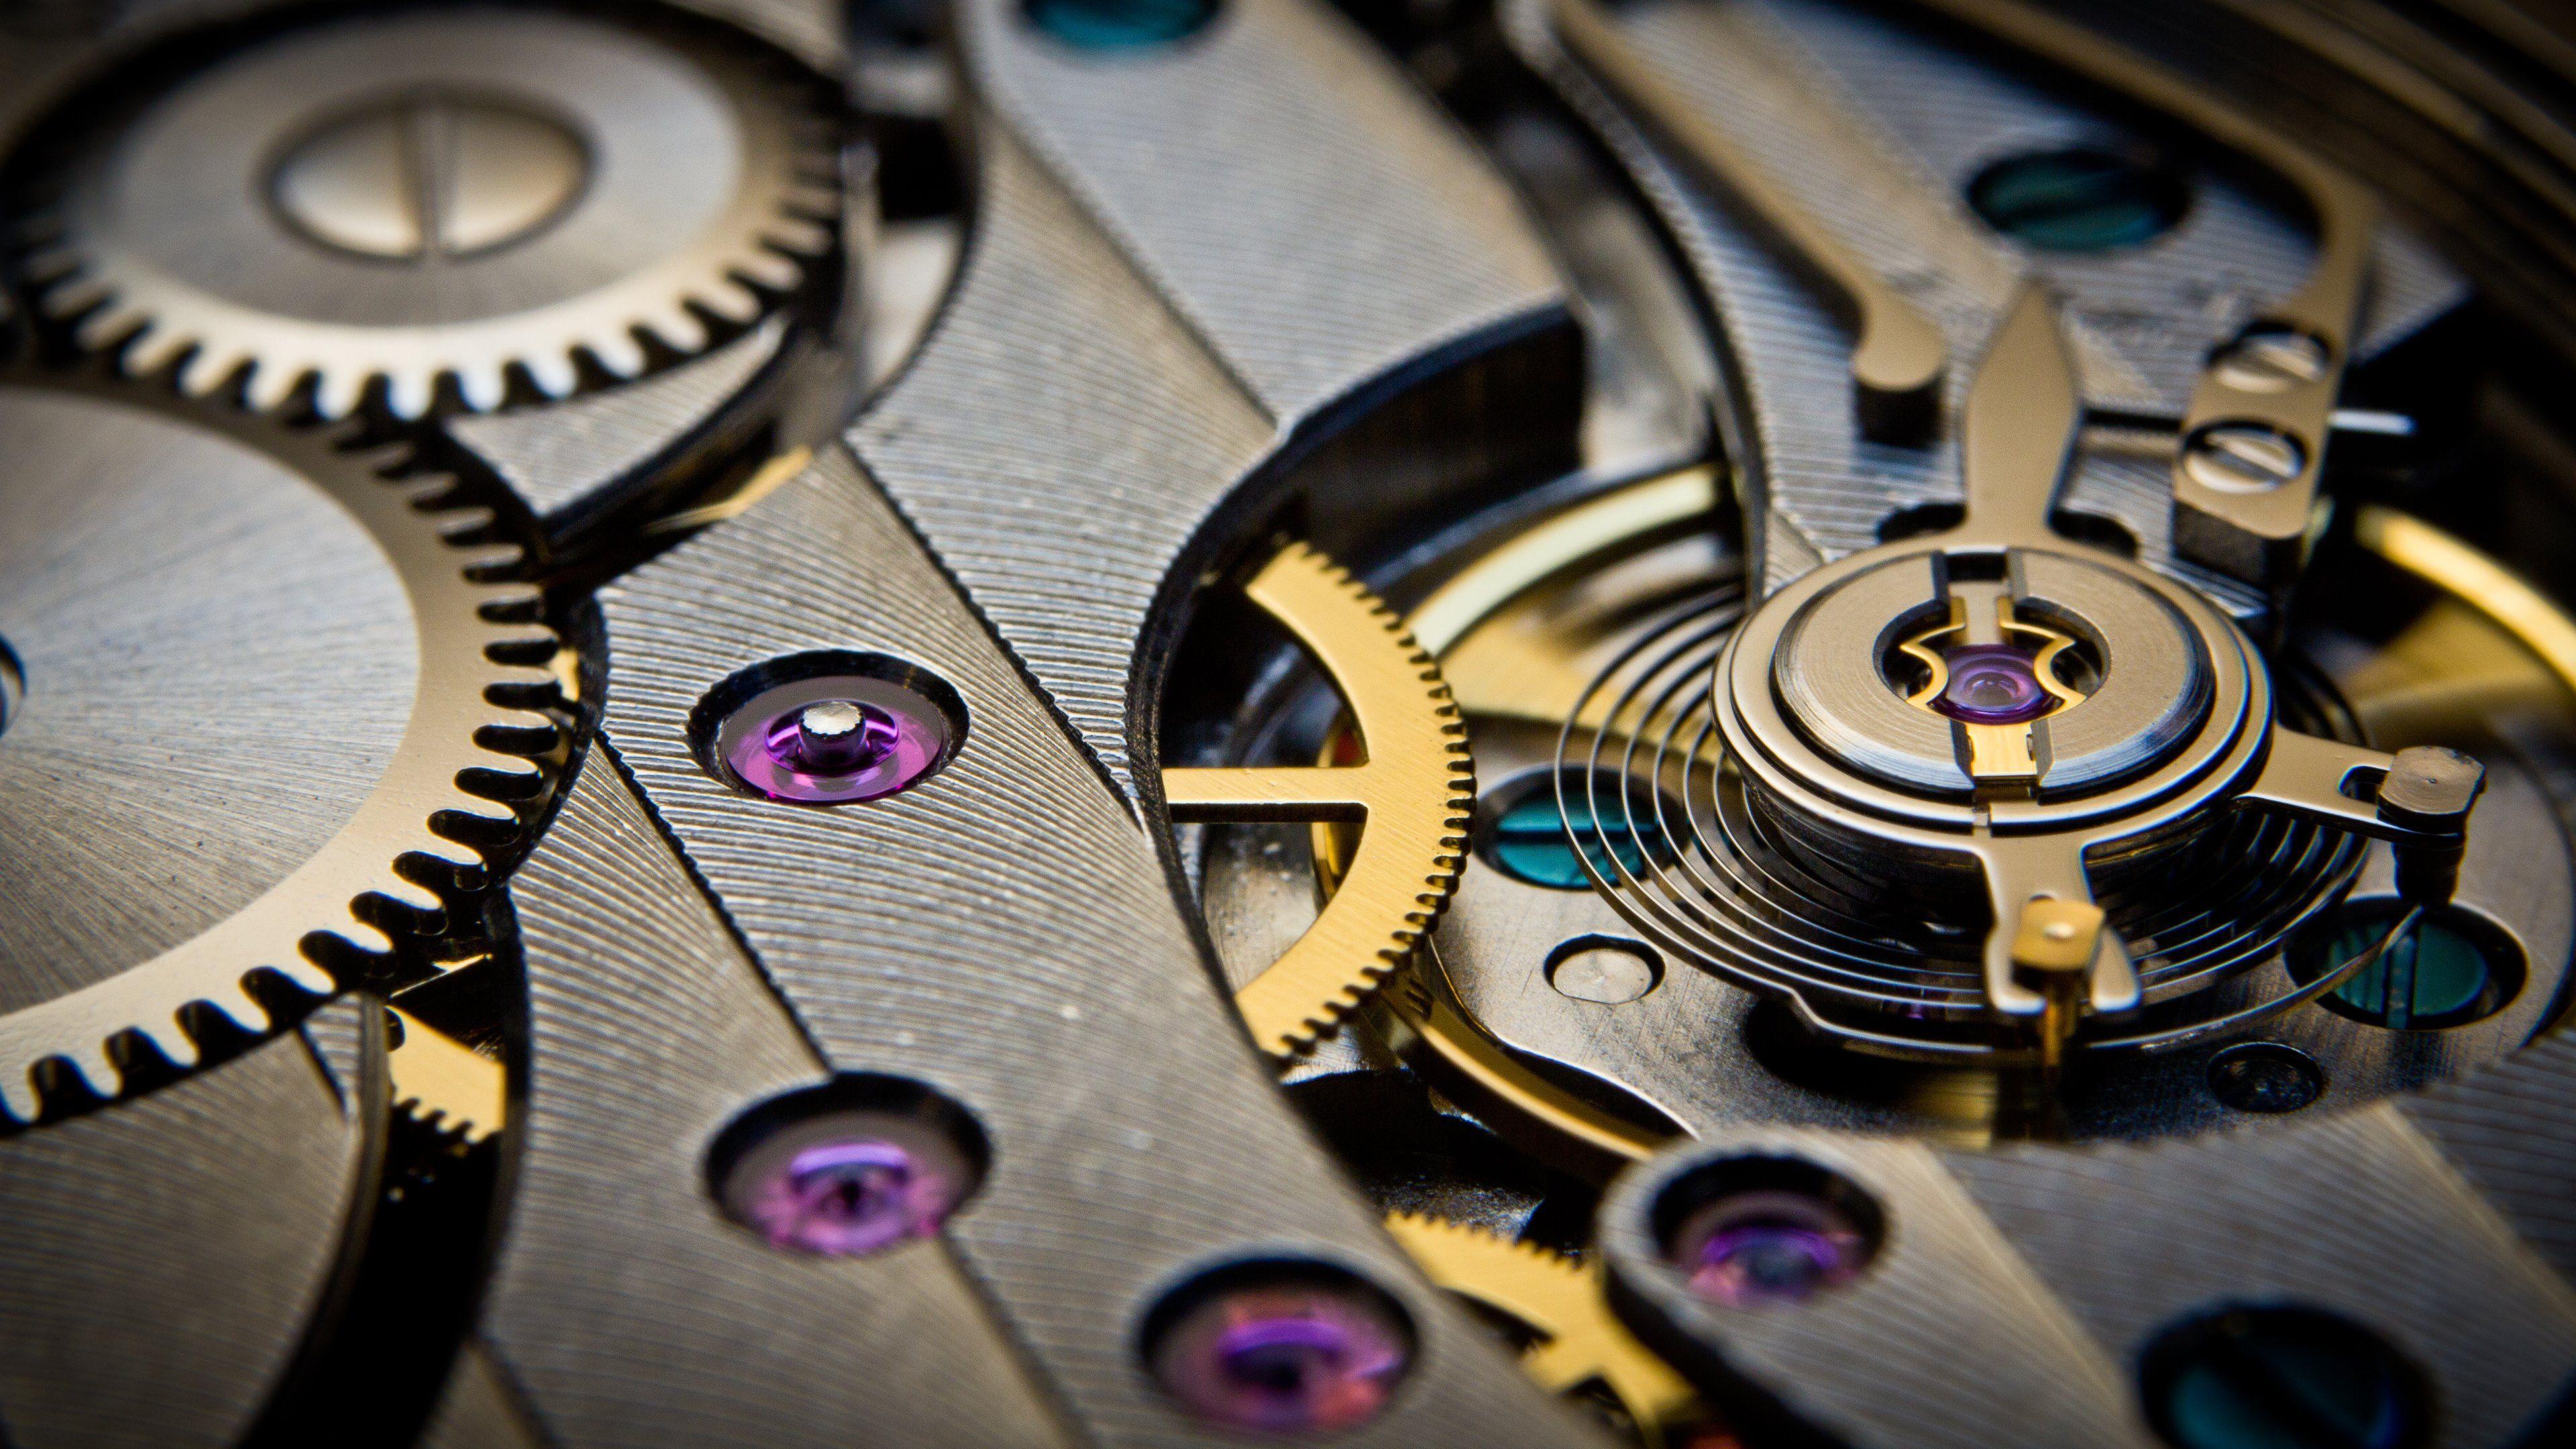 Mechanical Watch Wallpapers   Top Mechanical Watch 3840x2160